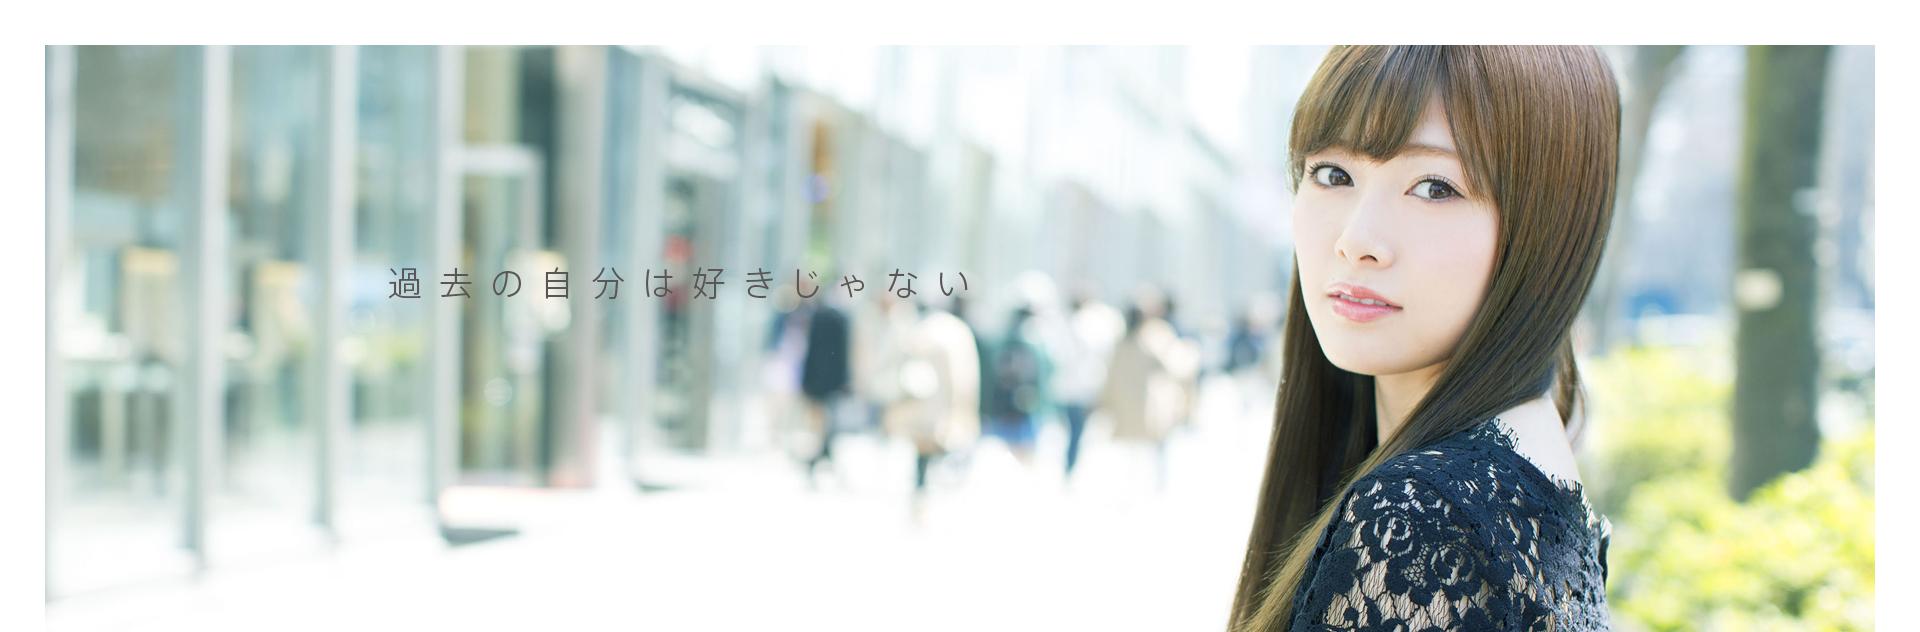 http://www.2015-nogizaka46.jp